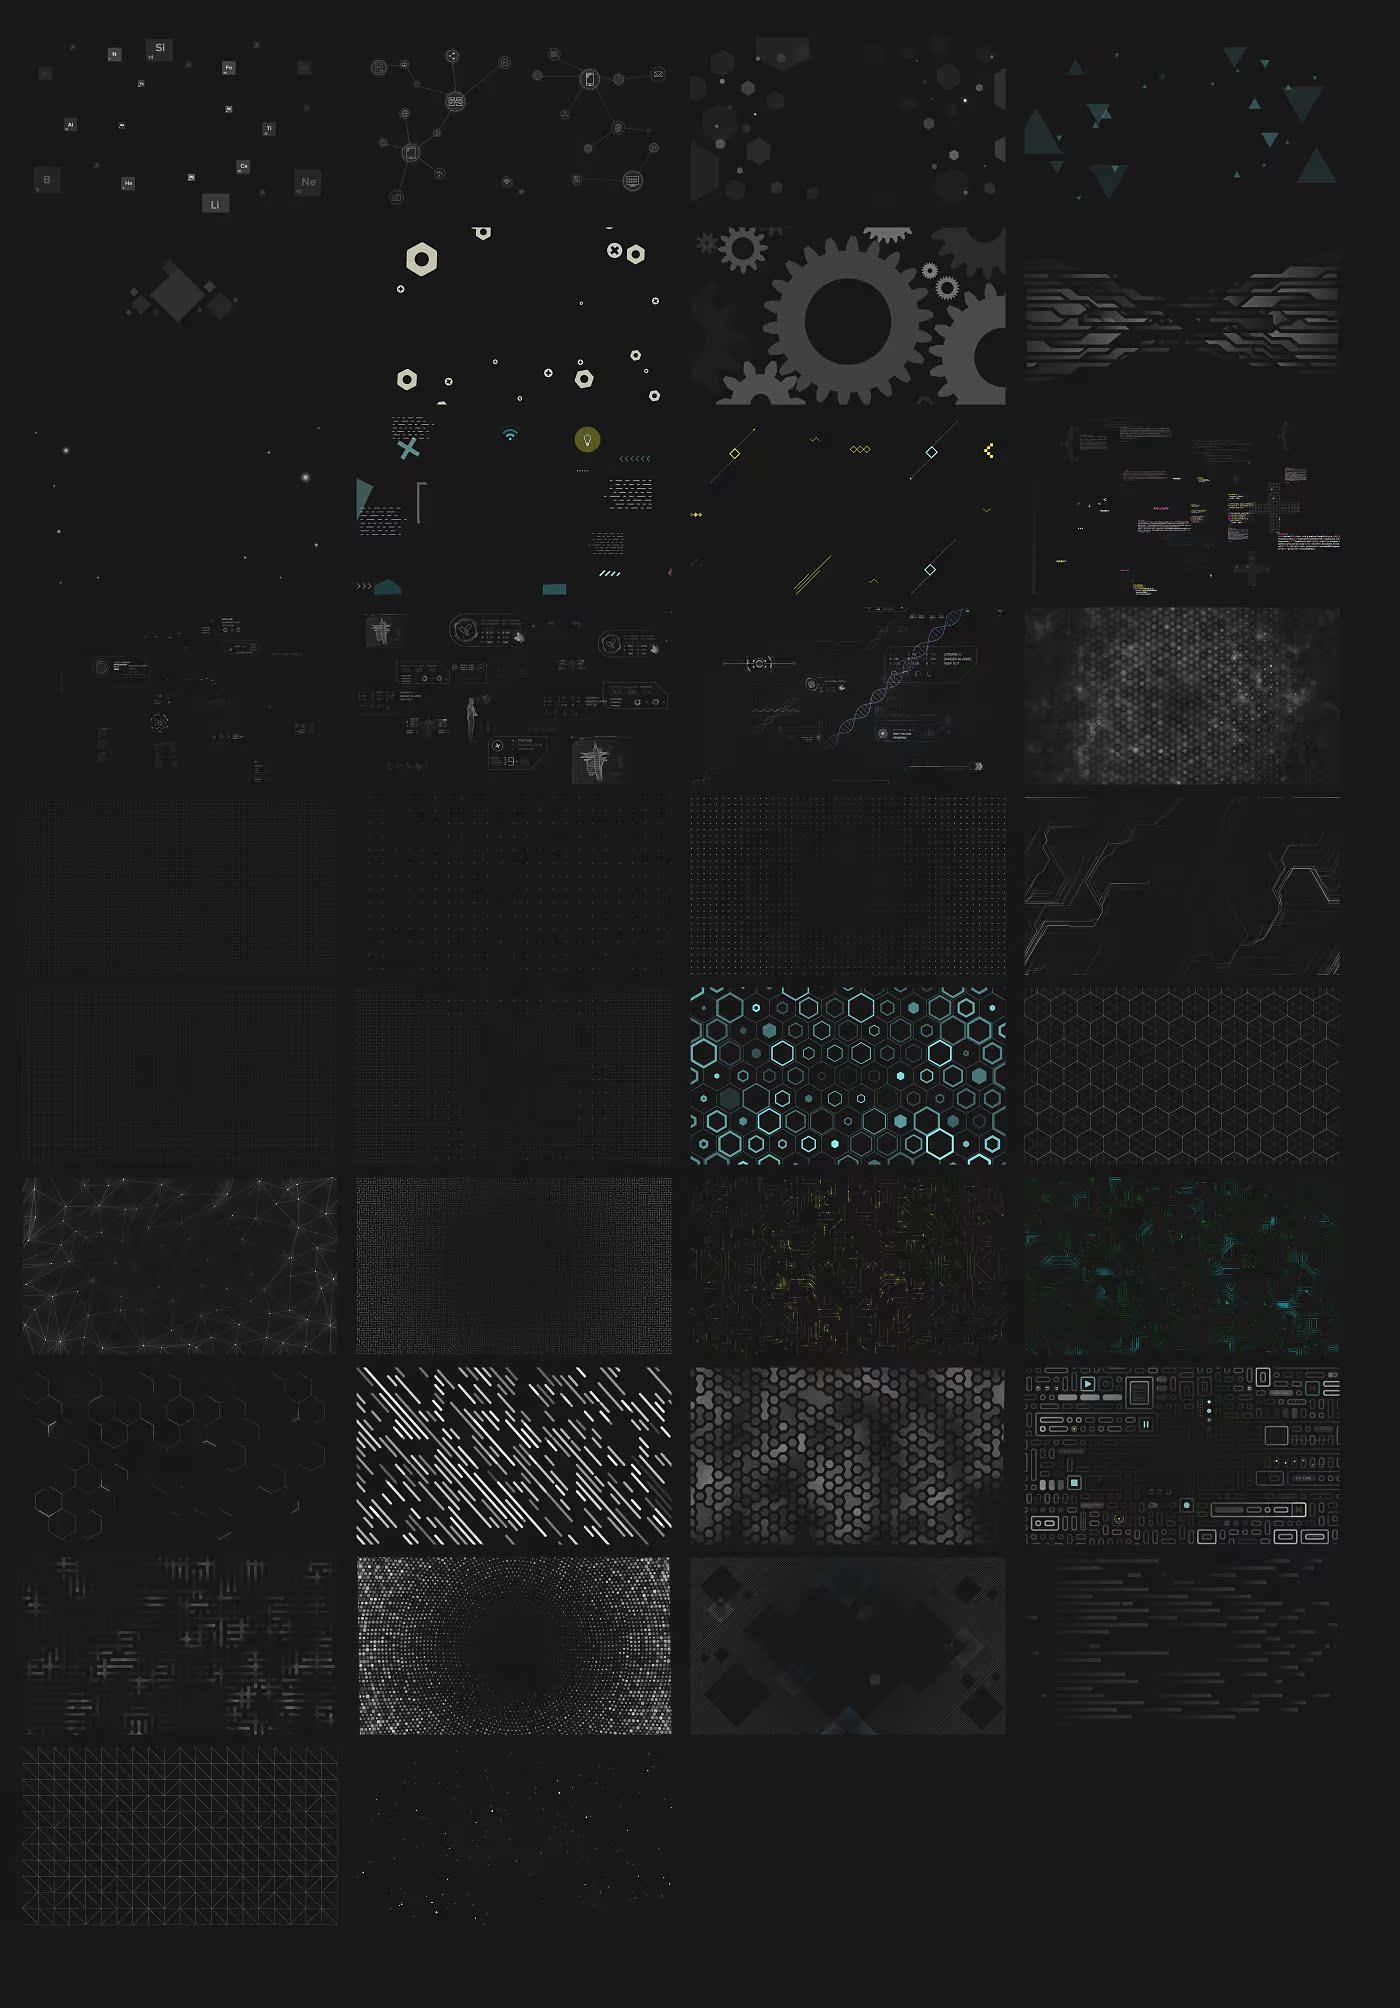 AE模板:高科技物理生物化学元素背景LOGO展示工具包